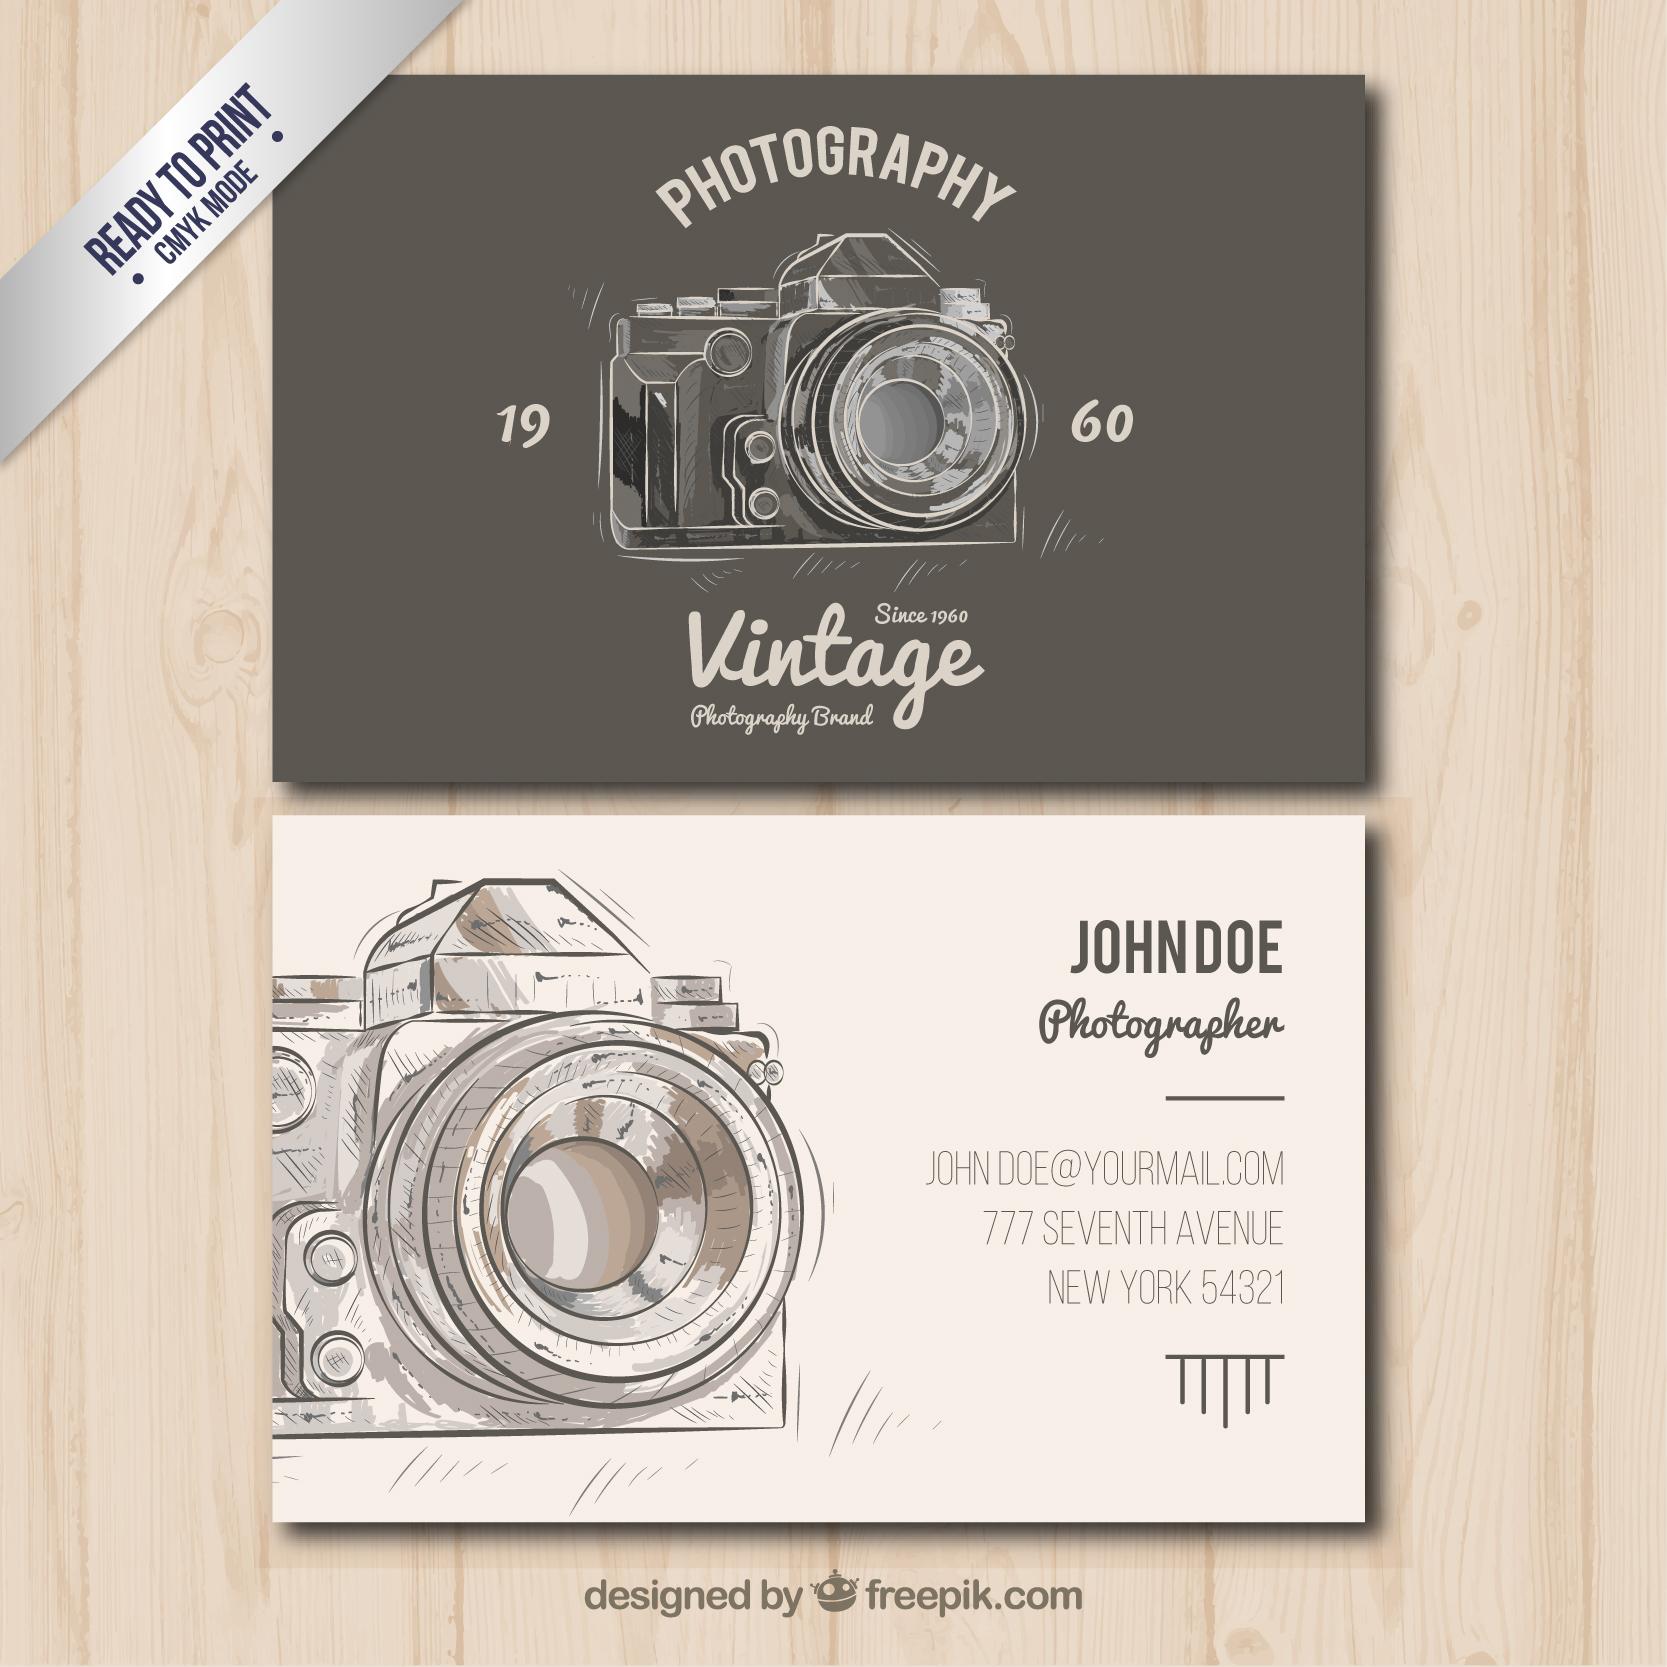 Mẫu in card visit photographer